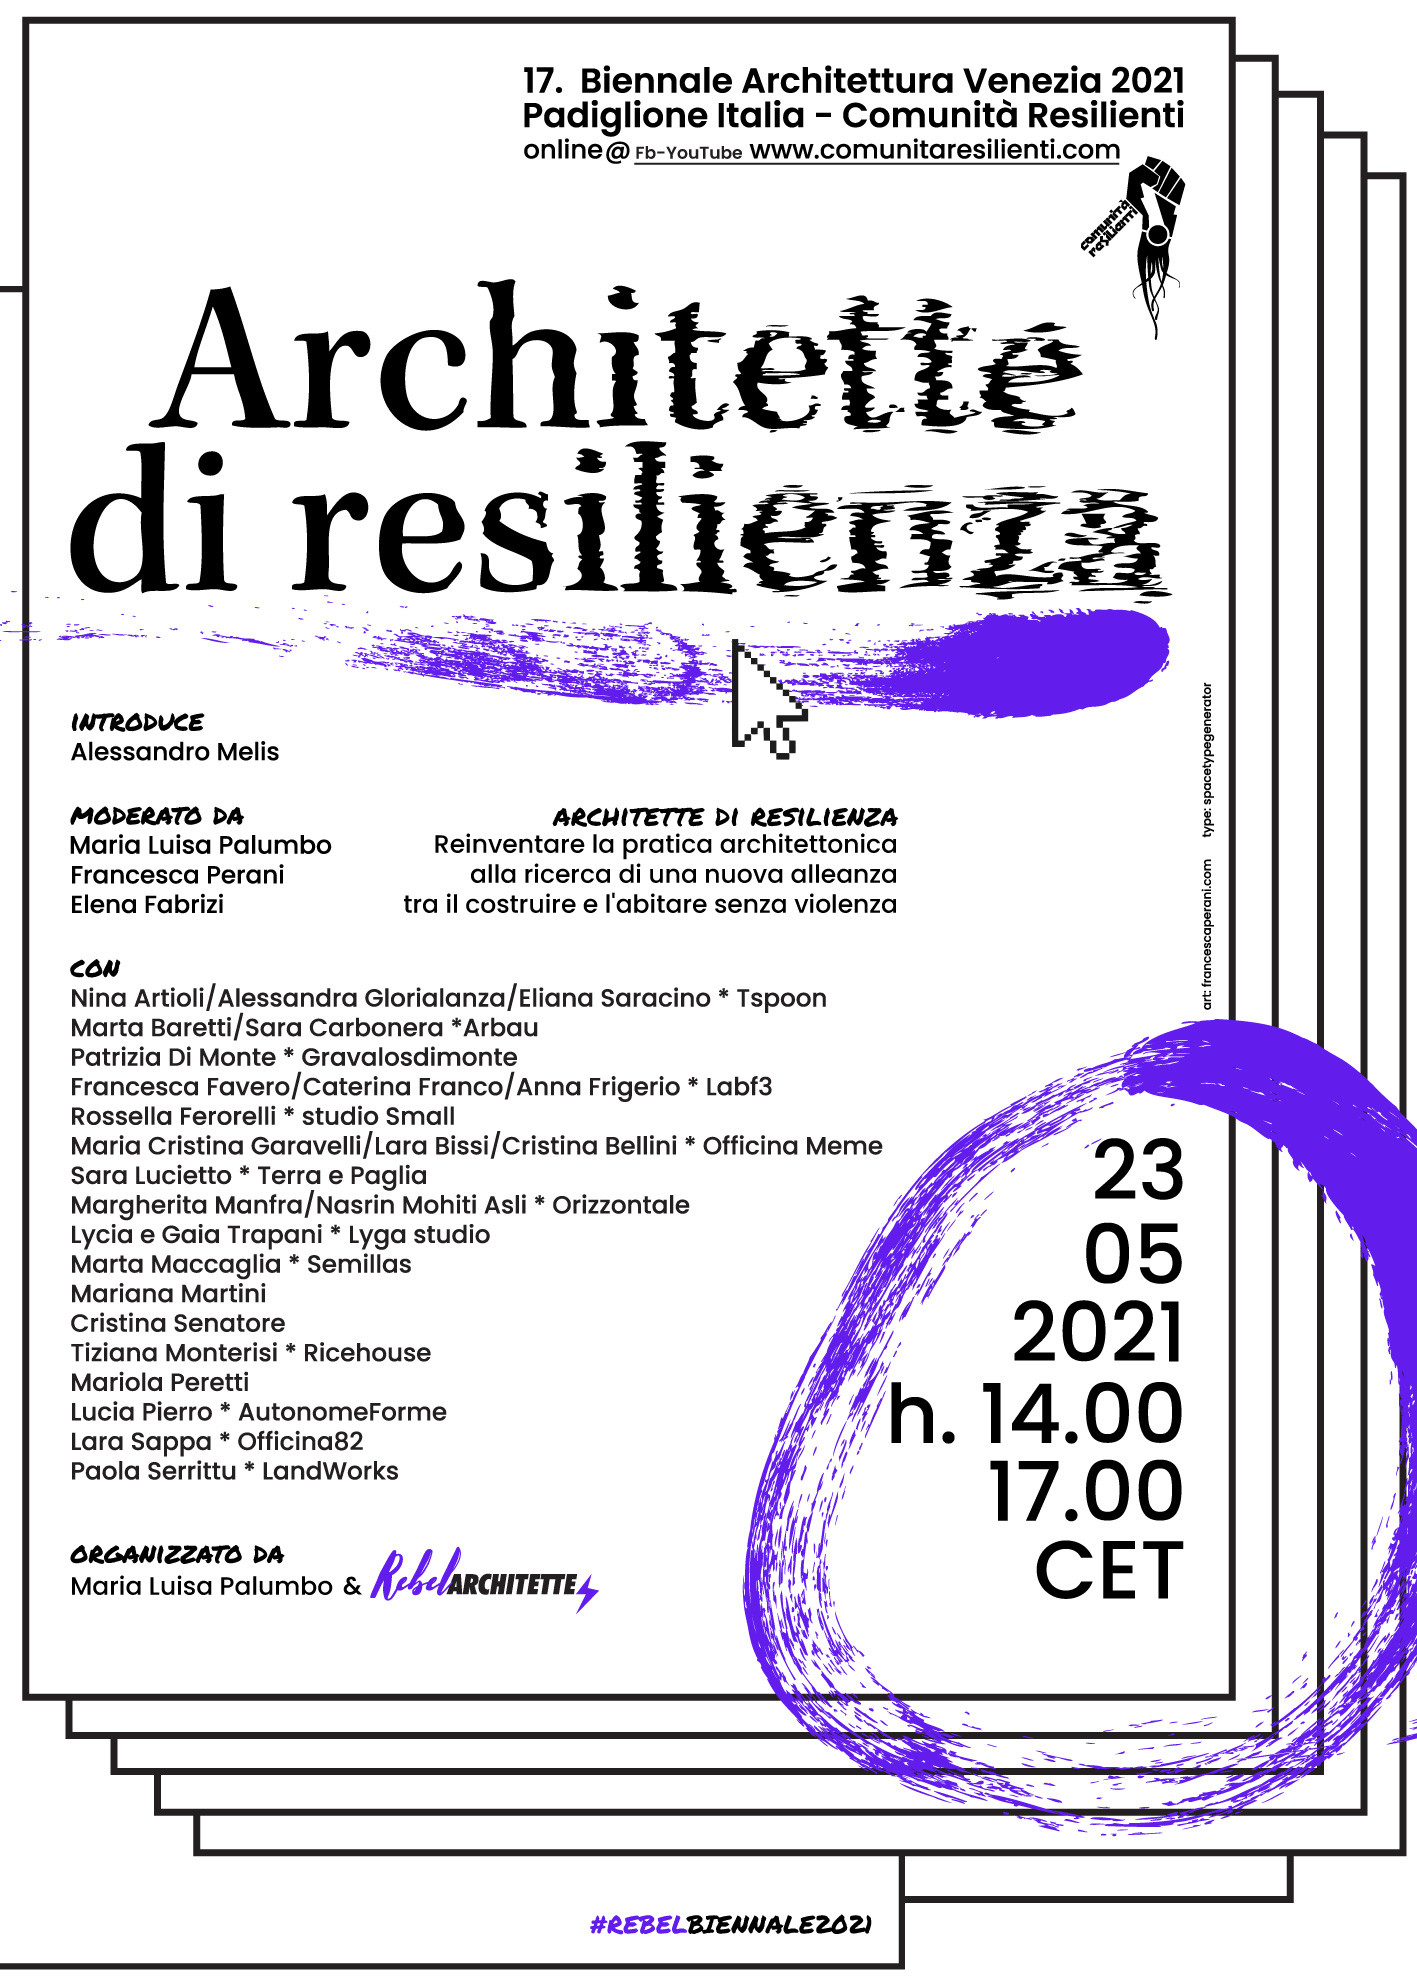 poster-biennale-architette